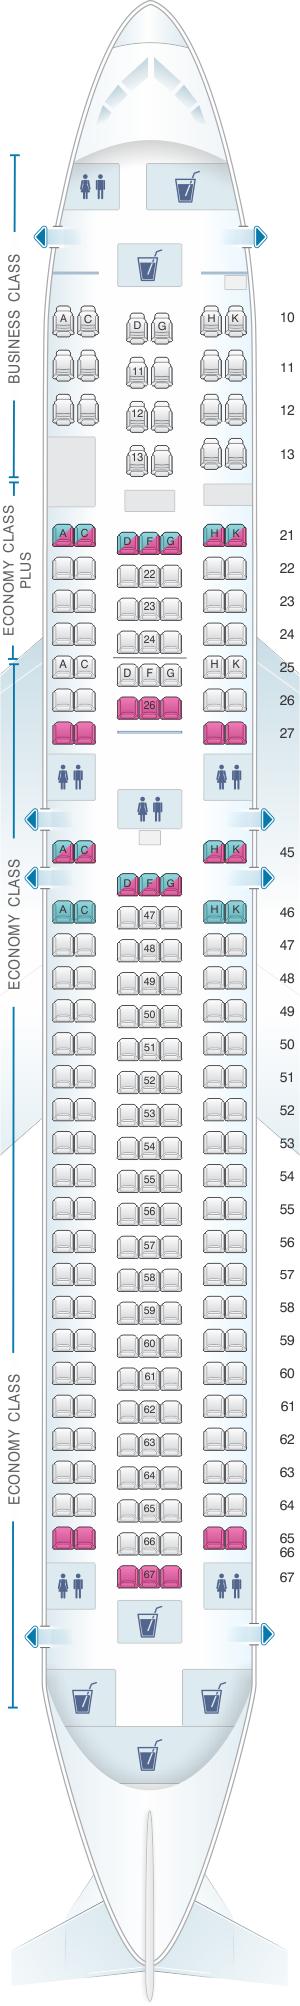 Seat map for El Al Israel Airlines Boeing B767 300ER 218pax